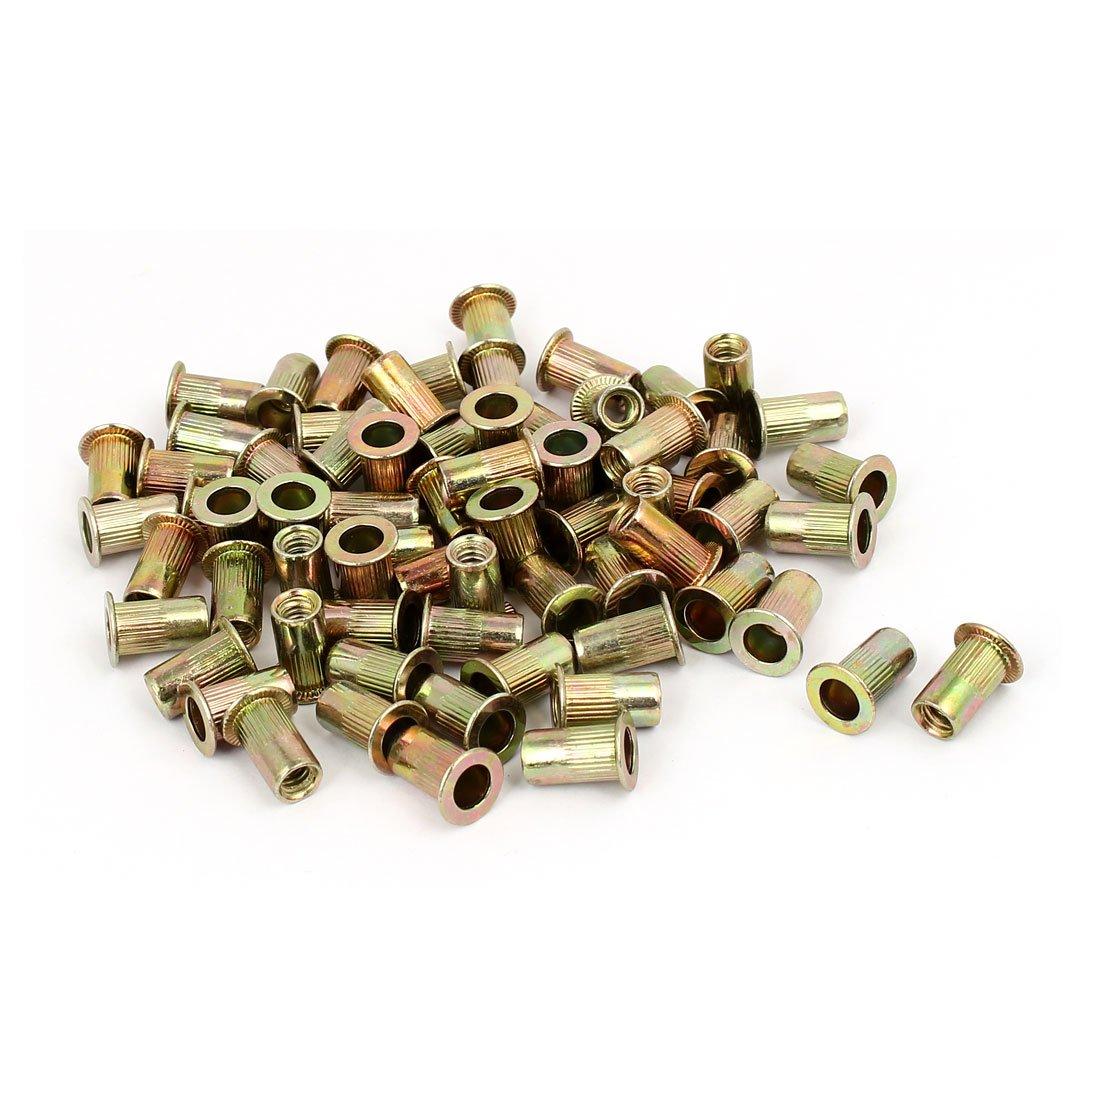 uxcell 10#24 Straight Knurled Rivet Nut Insert Nutsert Bronze Tone 100pcs